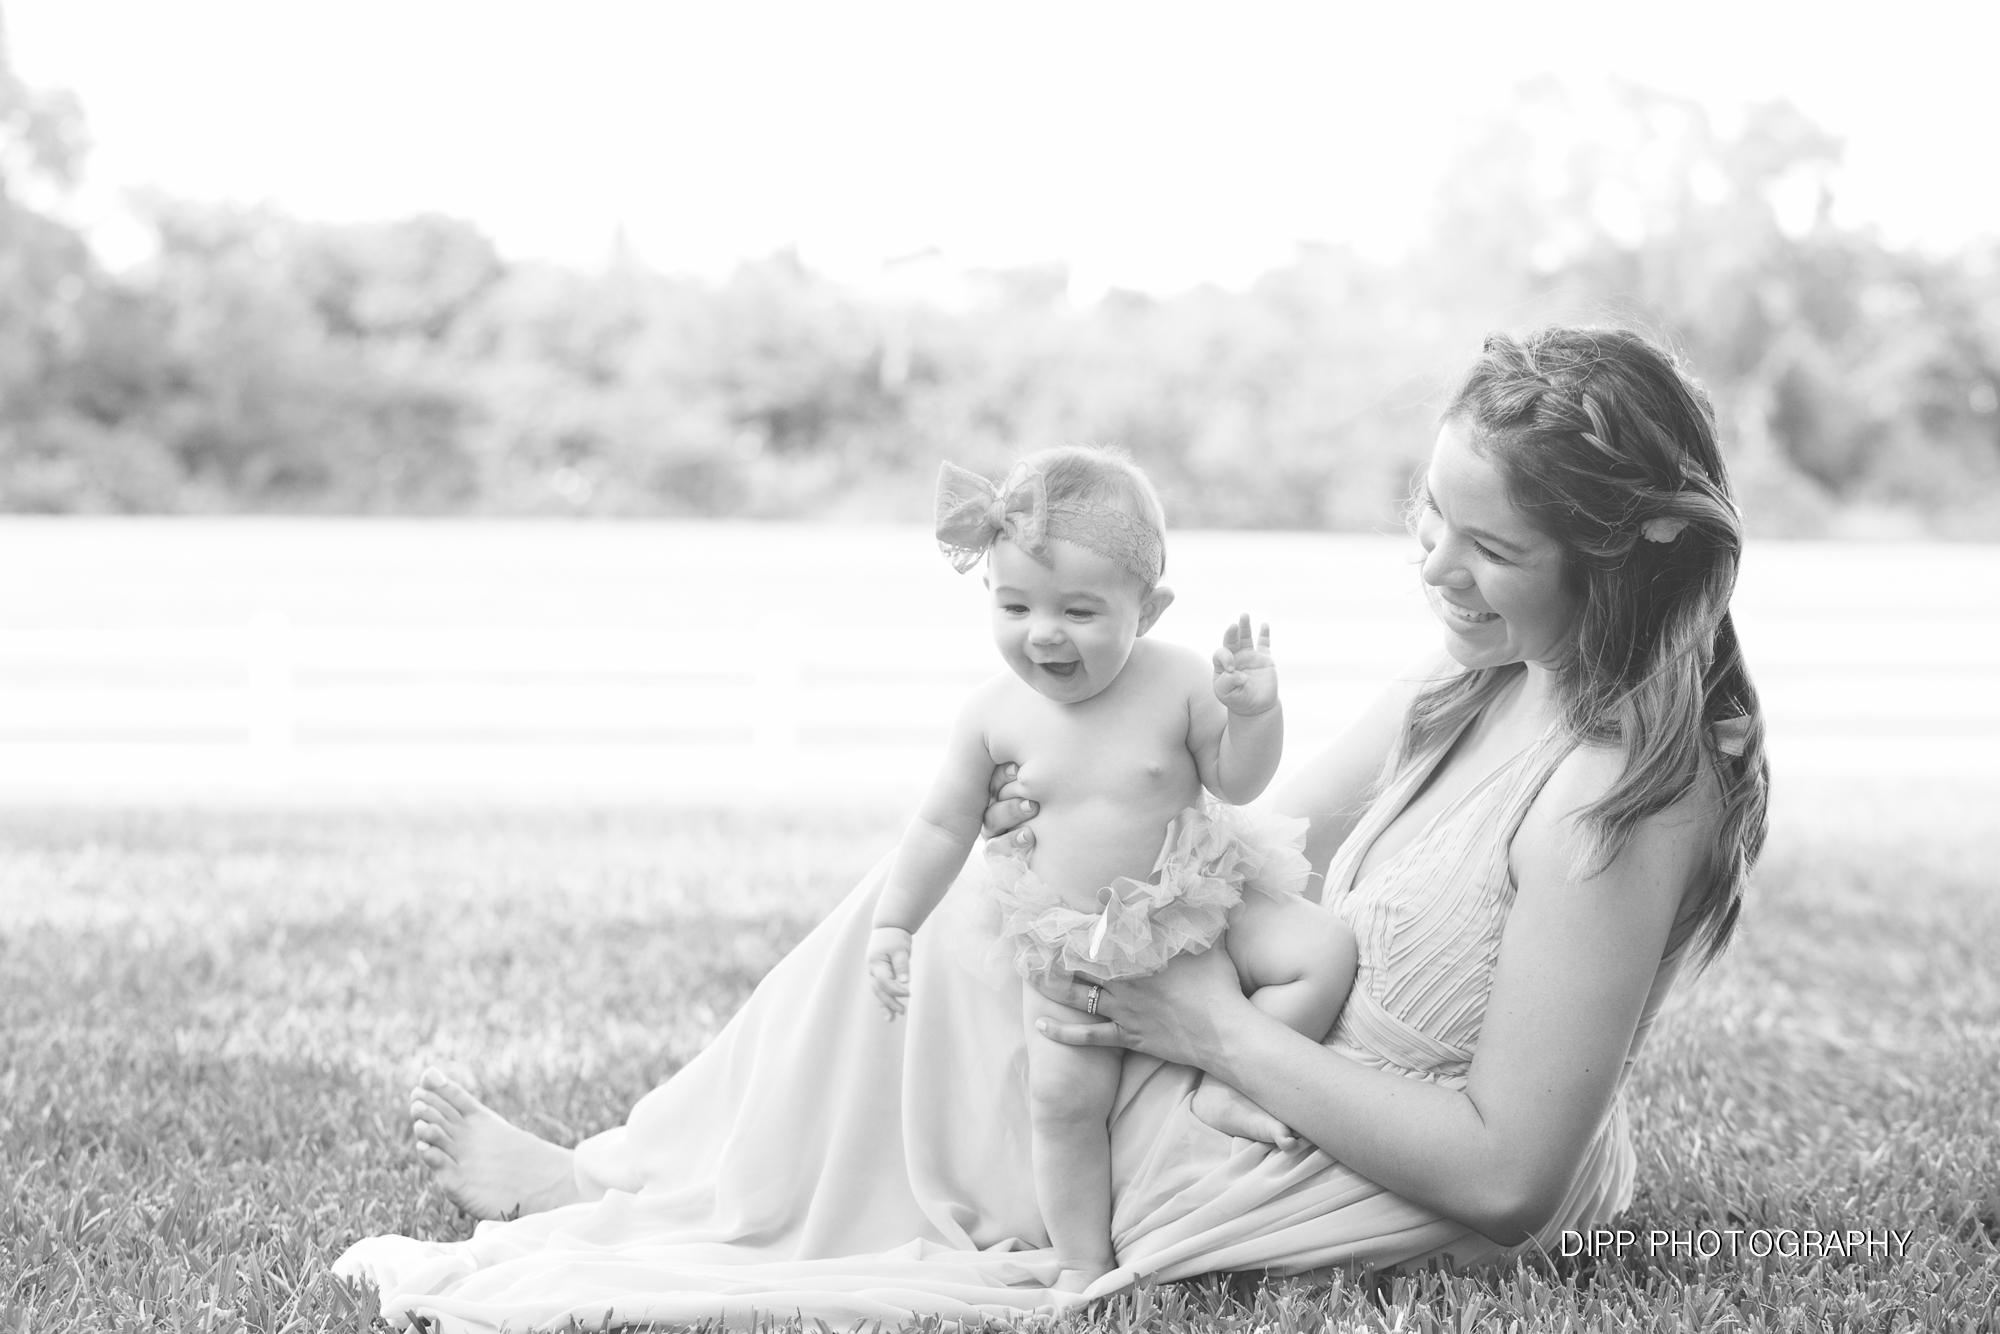 Dipp_2016 Gabrielle's 6 Months-327-Edit